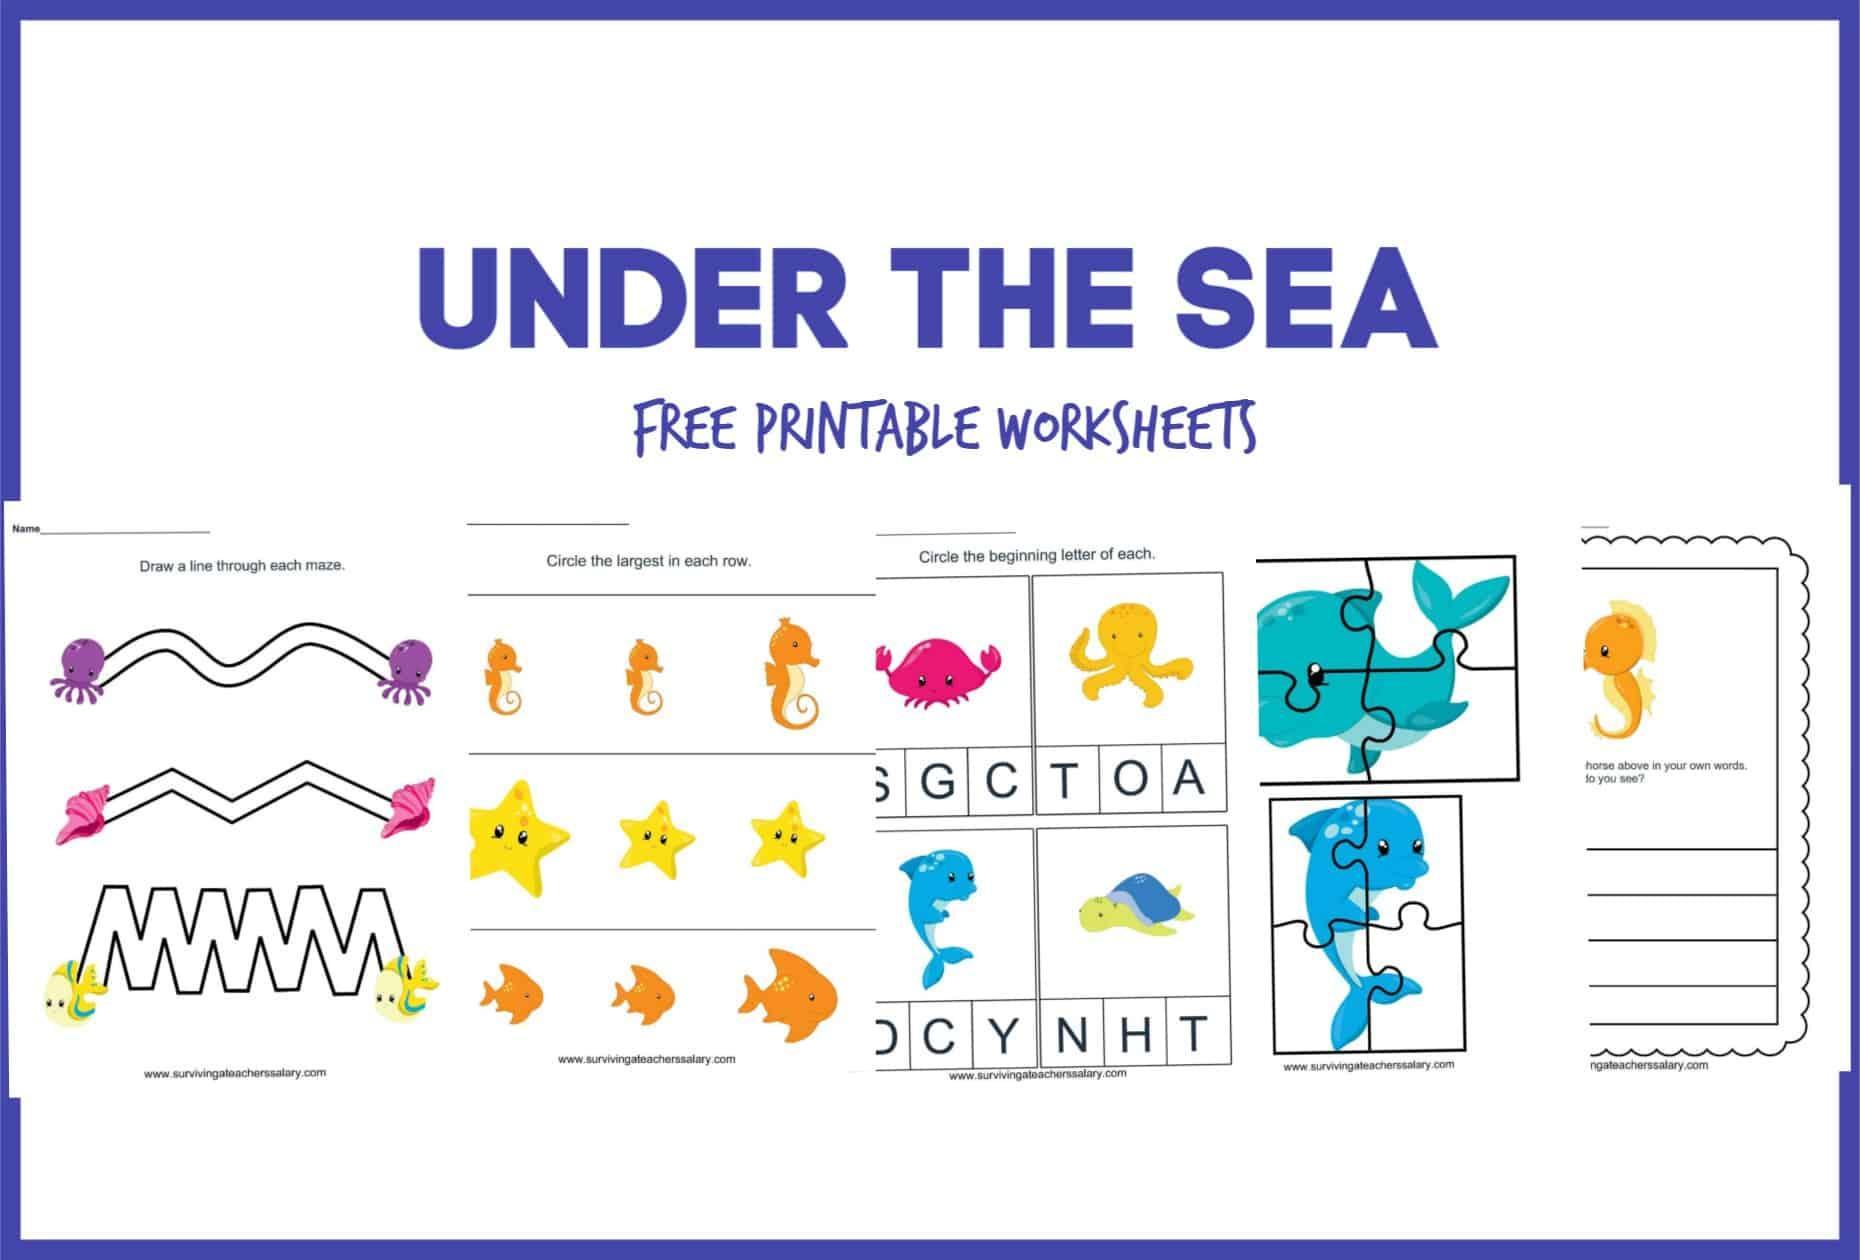 Under The Sea Worksheets For Preschool